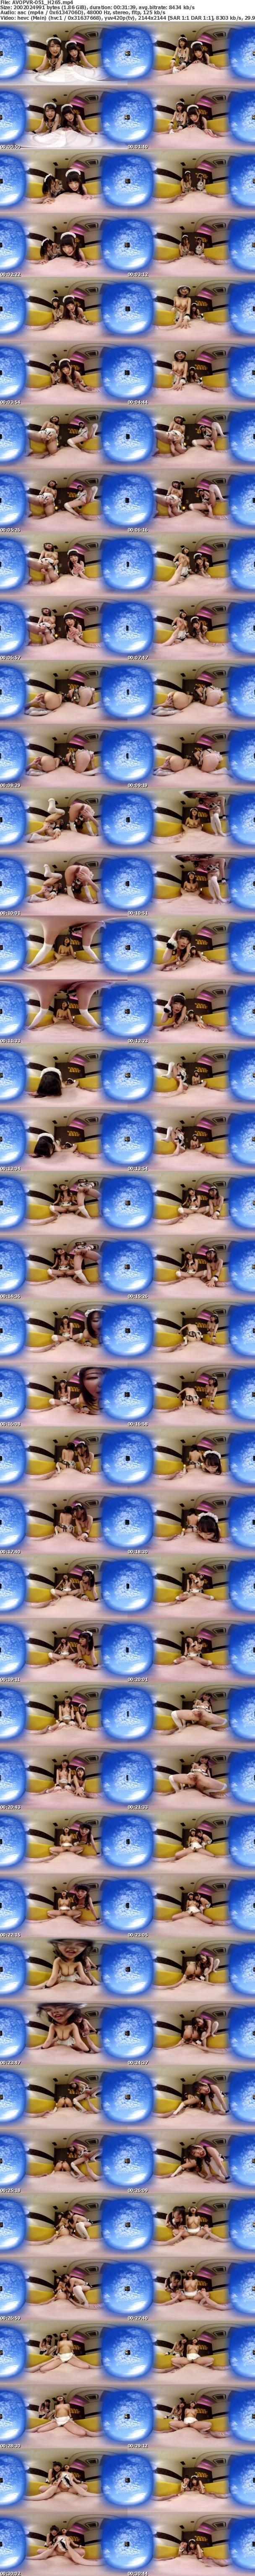 VR/3D AVOPVR-051 【VR】SCOOP×VR むっちり巨乳メイド×スレンダー痴女メイド Wナマ中出しSEX いくみちゃん 愛ちゃん